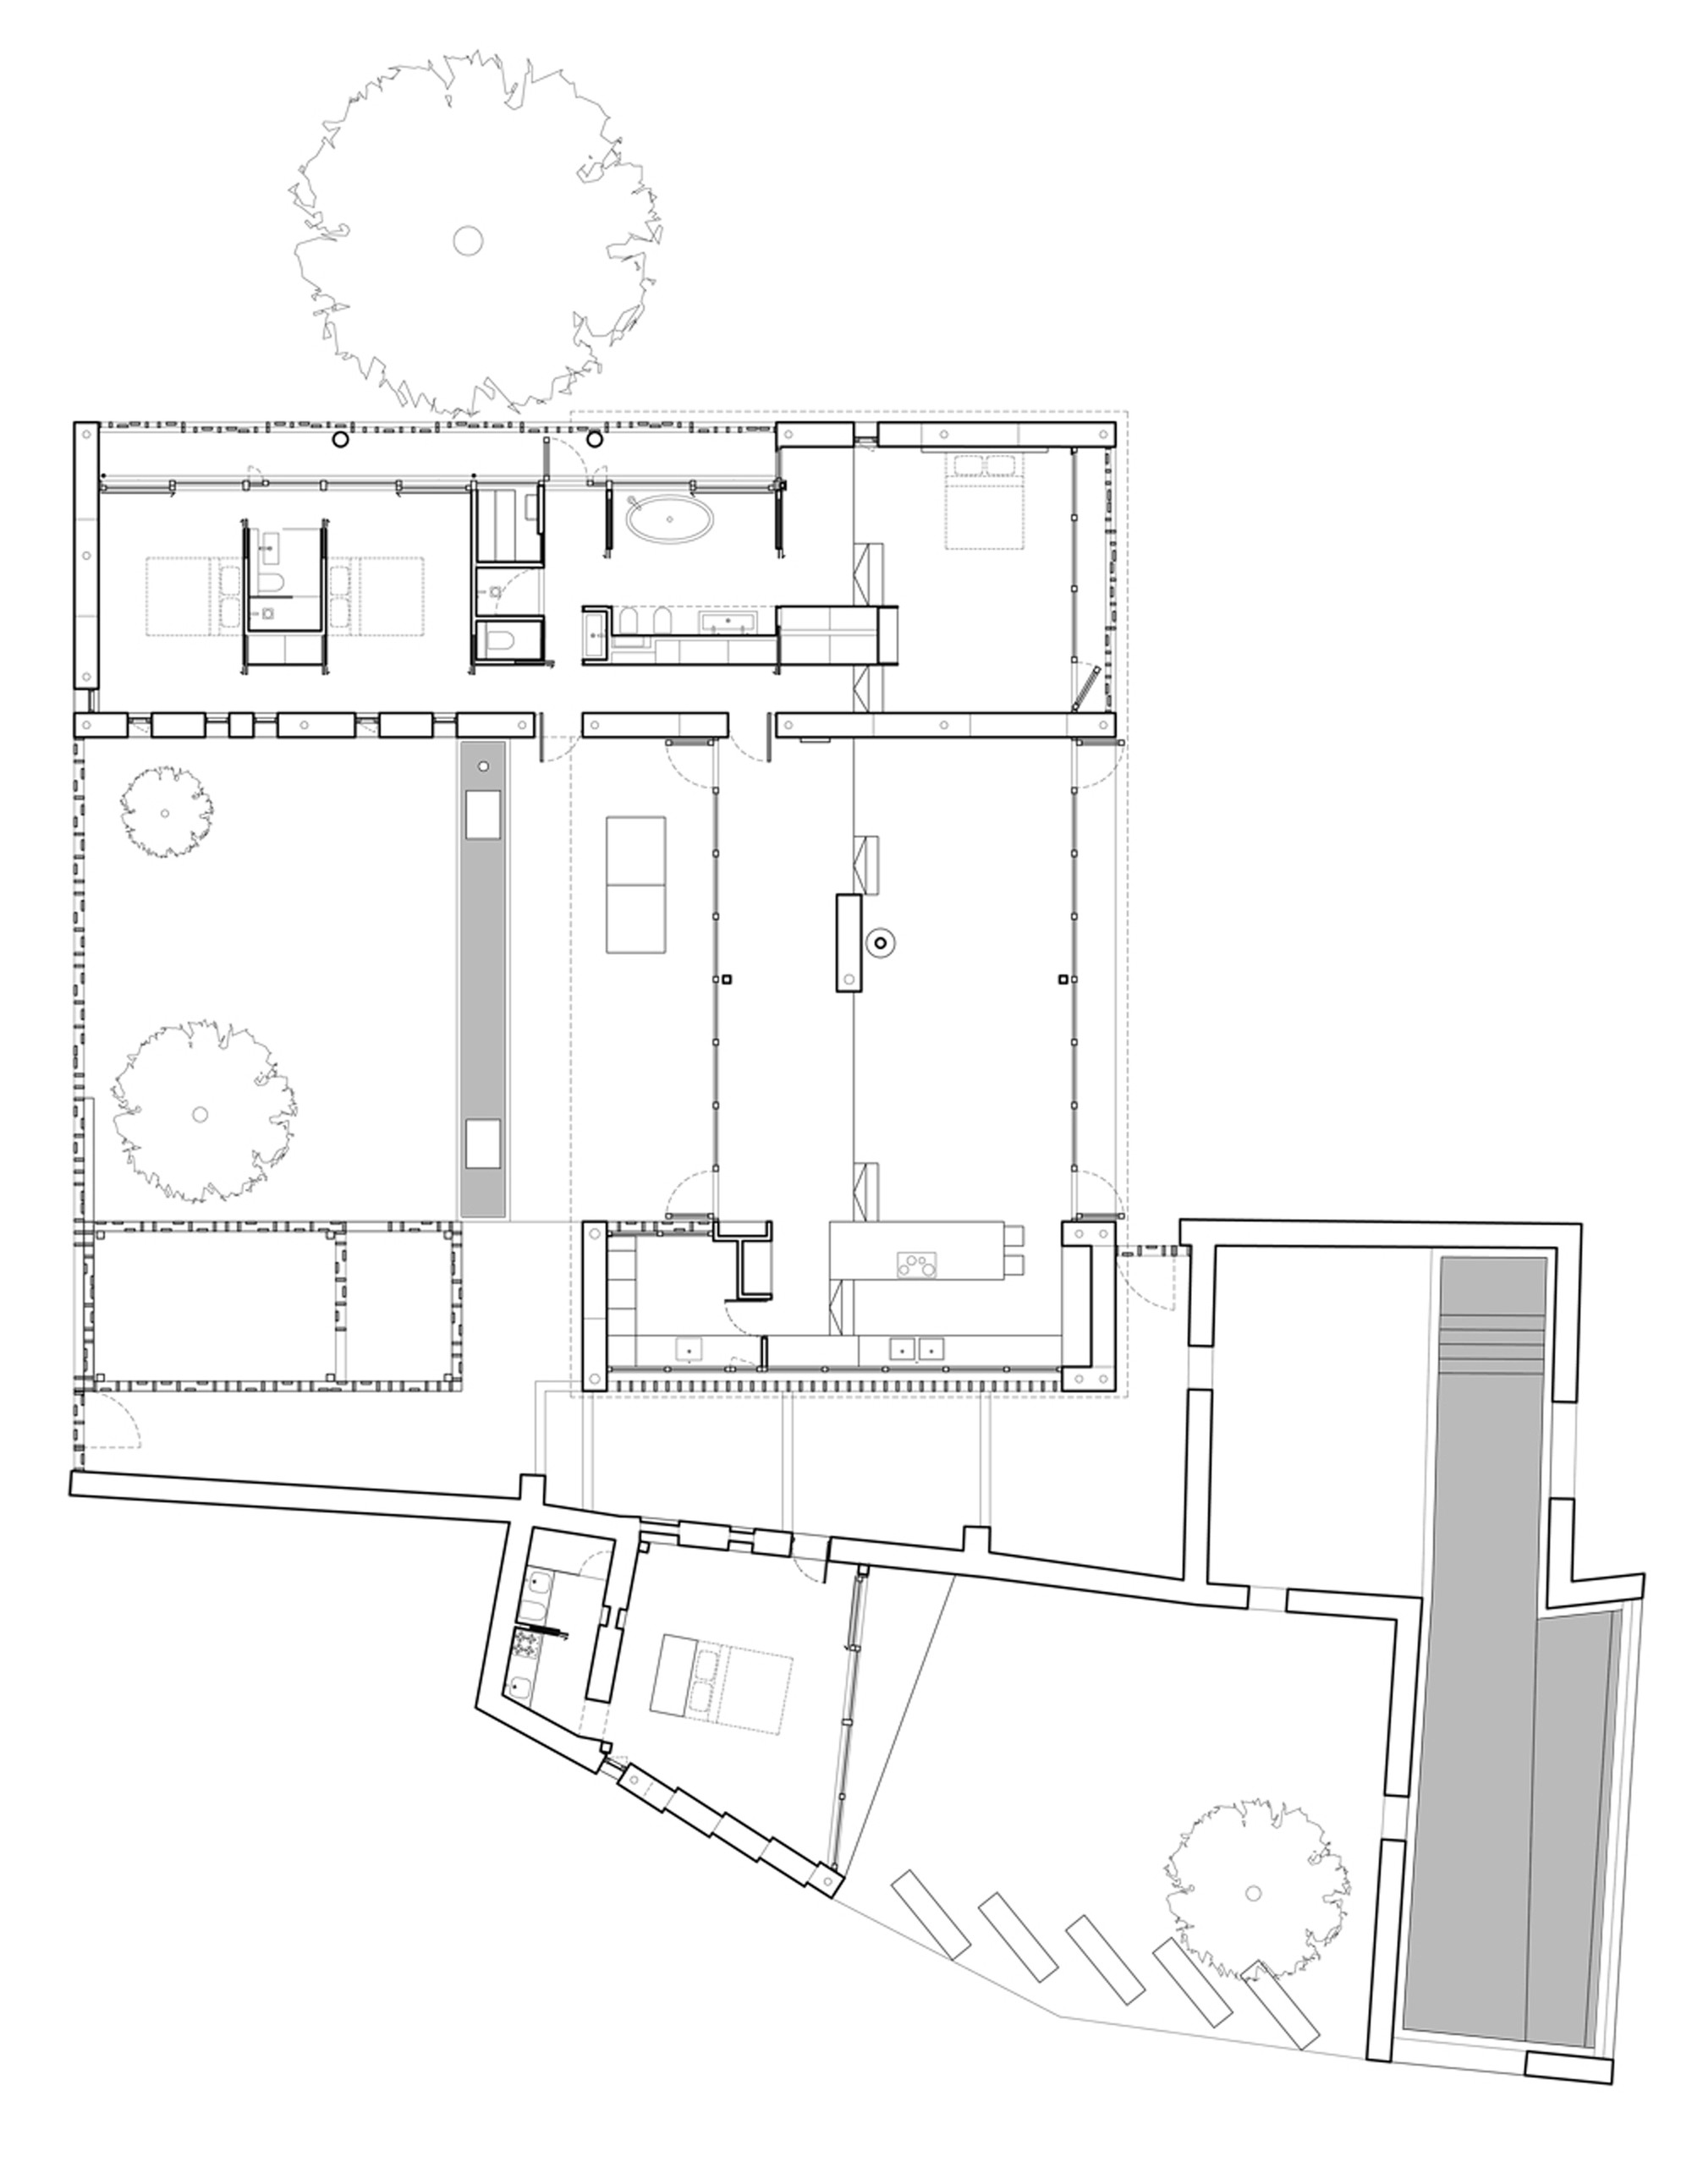 galeria de casa de pedra carl fredrik svenstedt architect 13. Black Bedroom Furniture Sets. Home Design Ideas